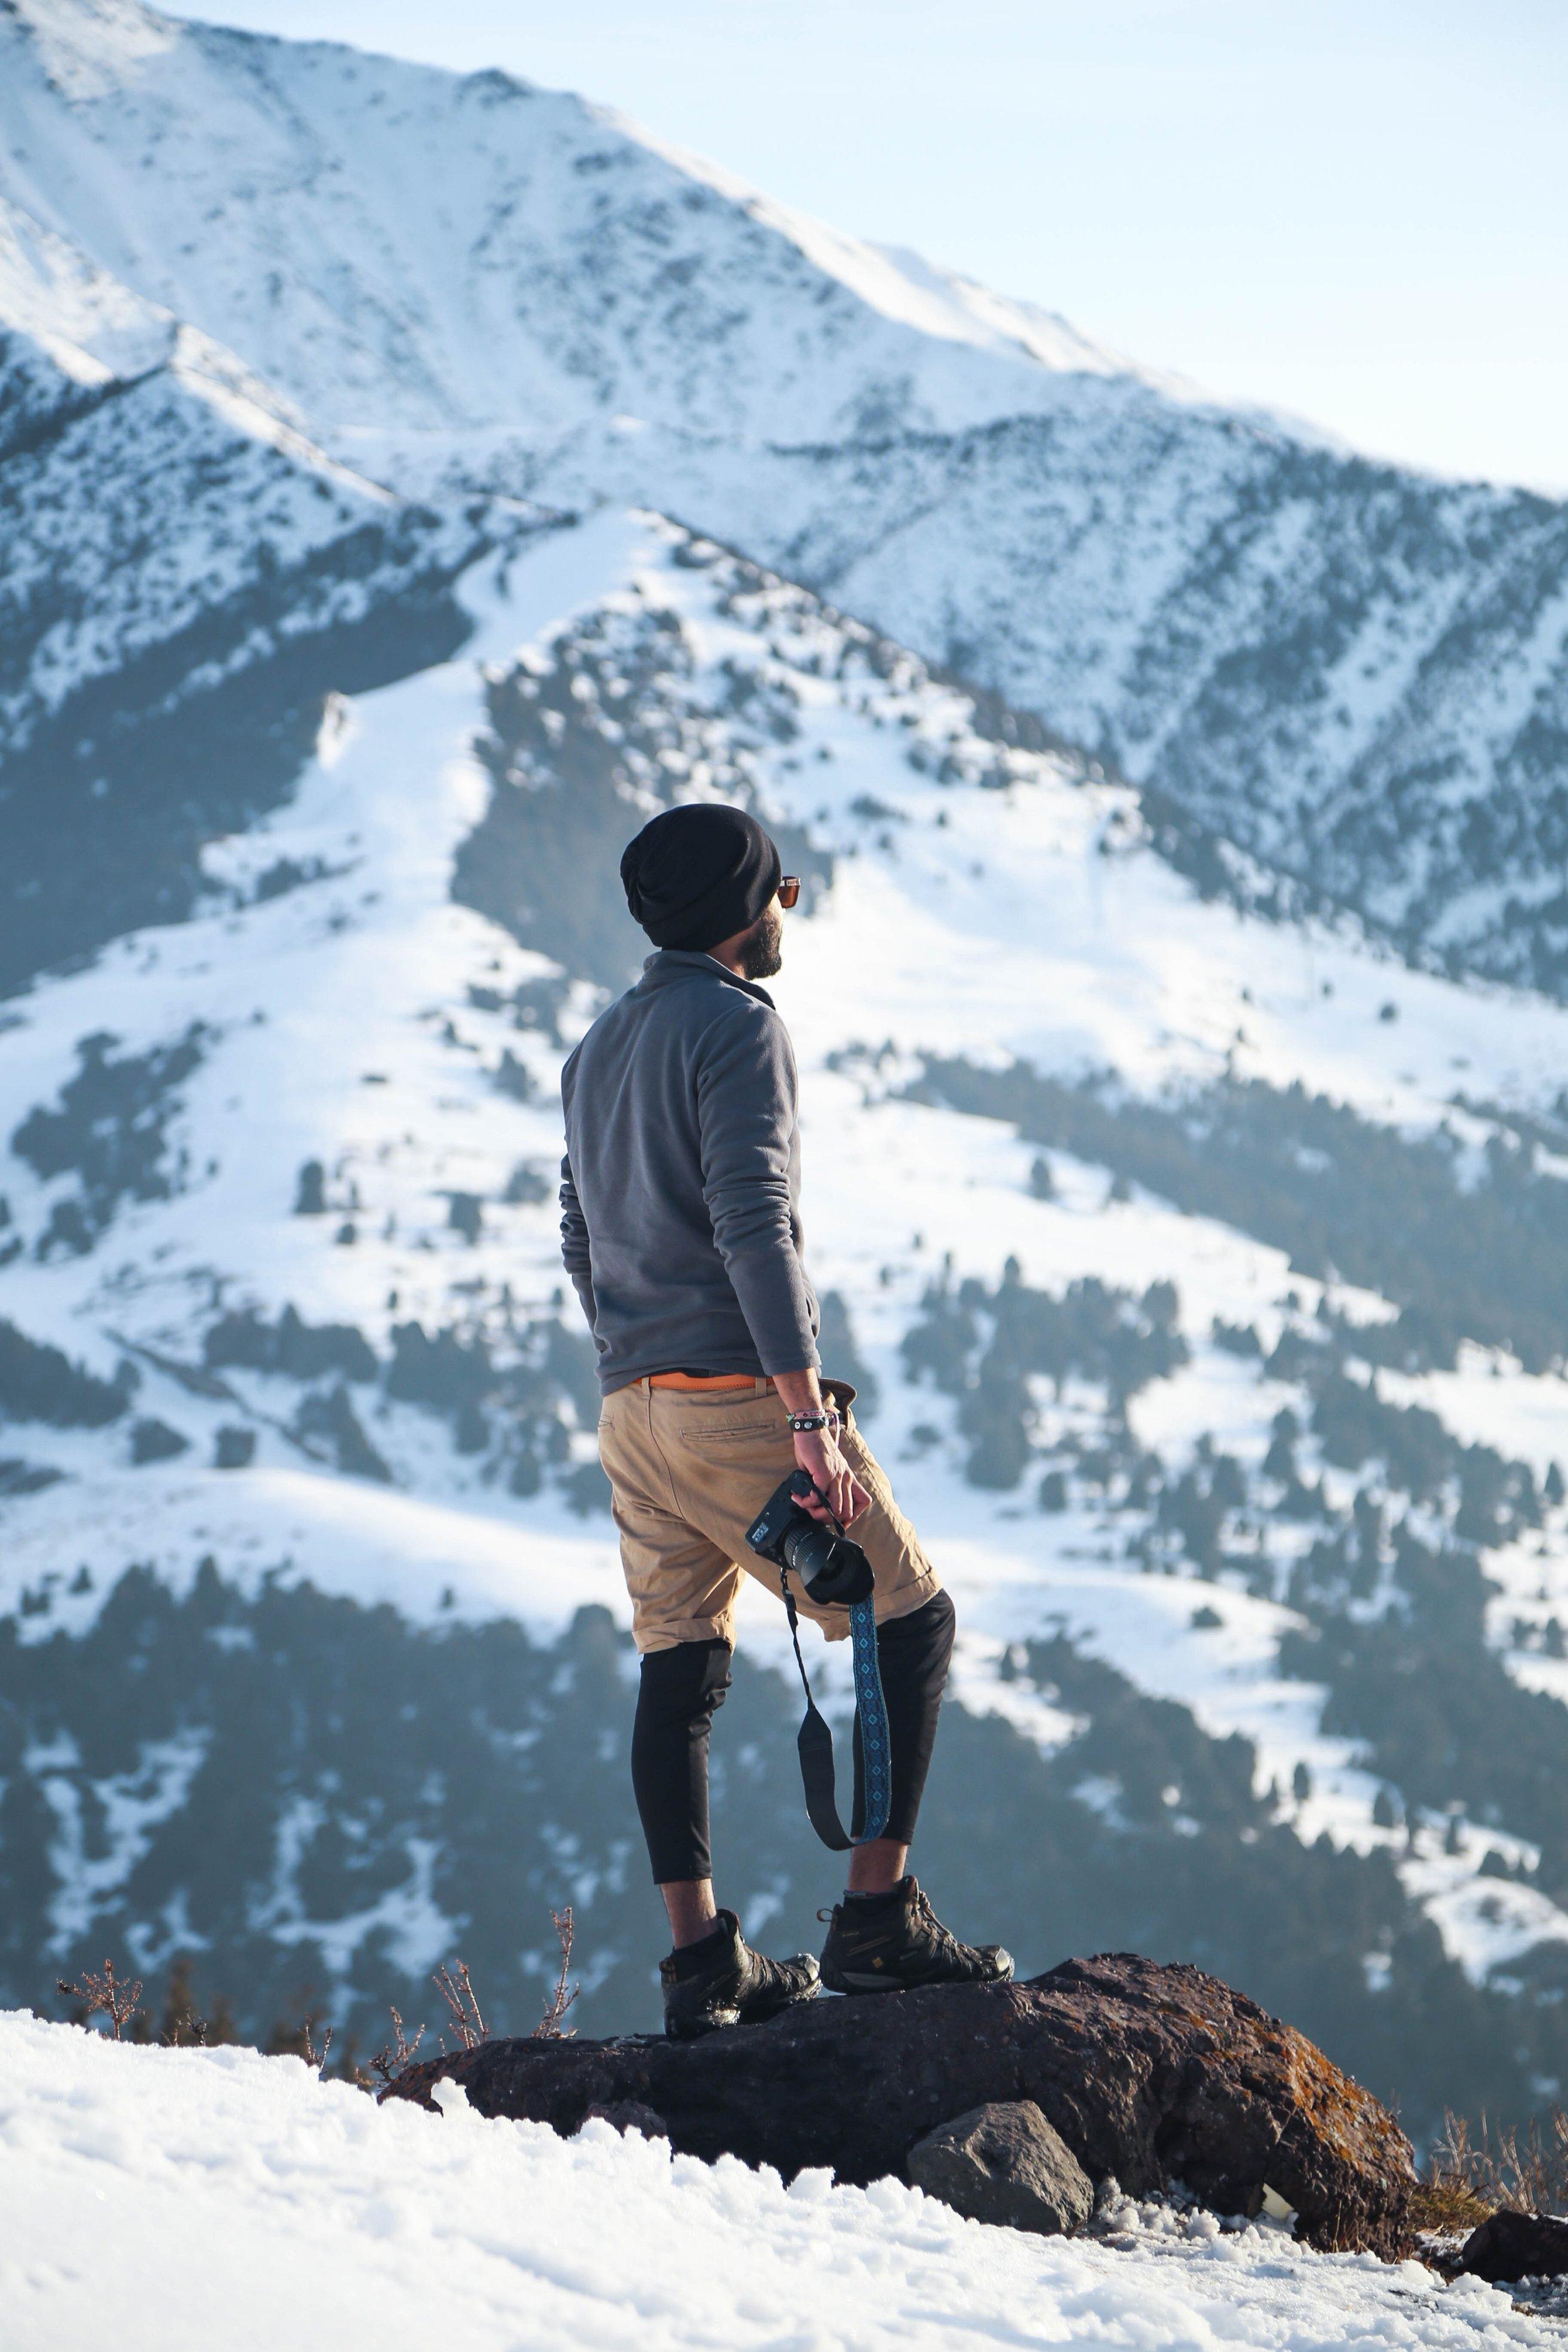 adventure-bonnet-camera-925263.jpg